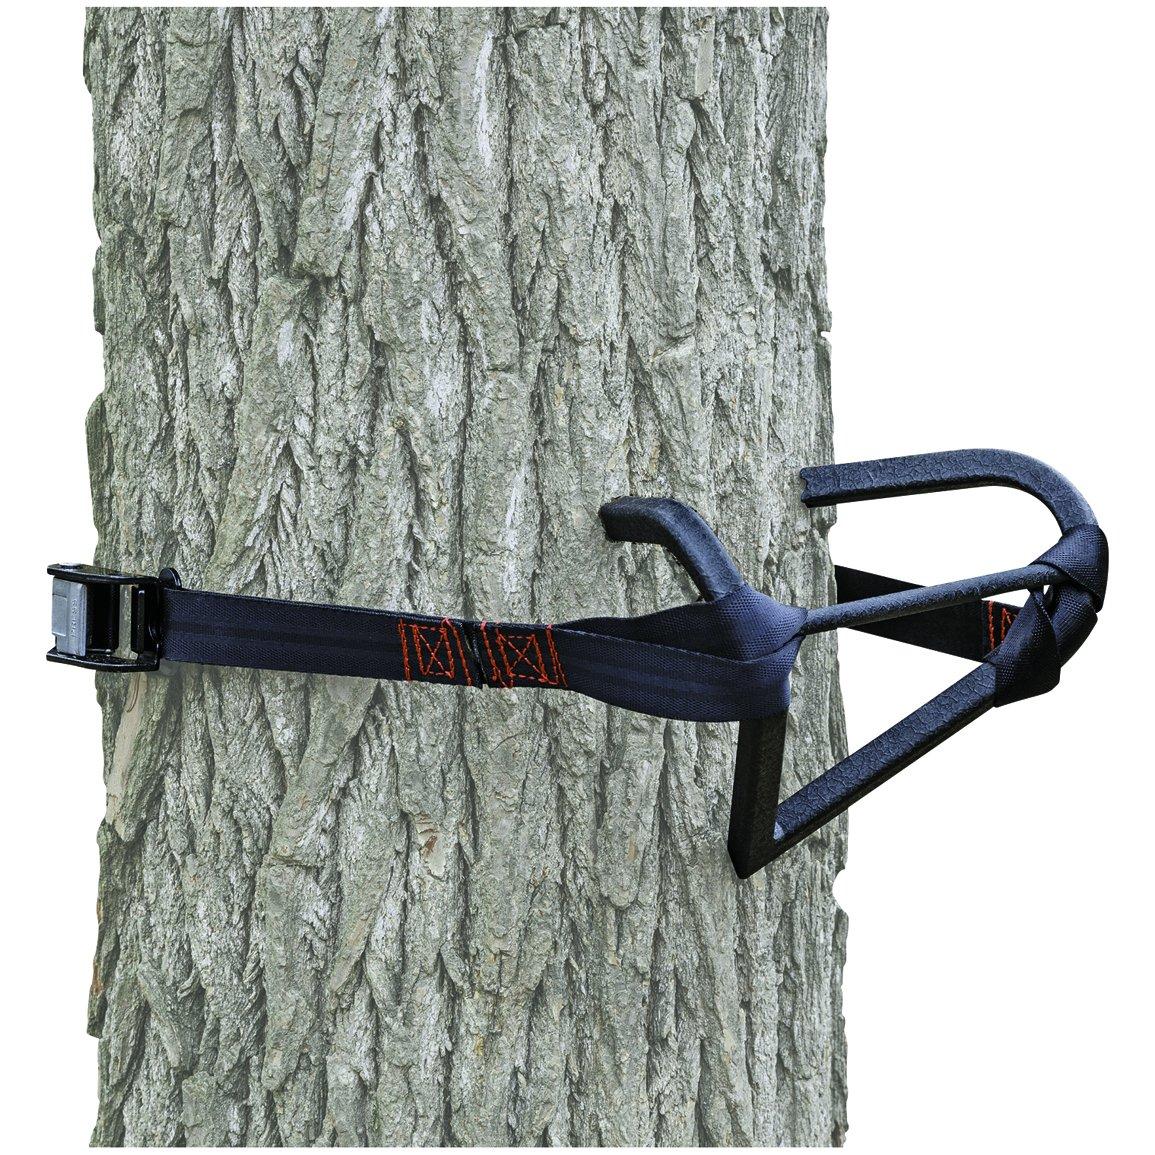 Primal tree stands strap on v treestep sporting goods for Deer stand steps